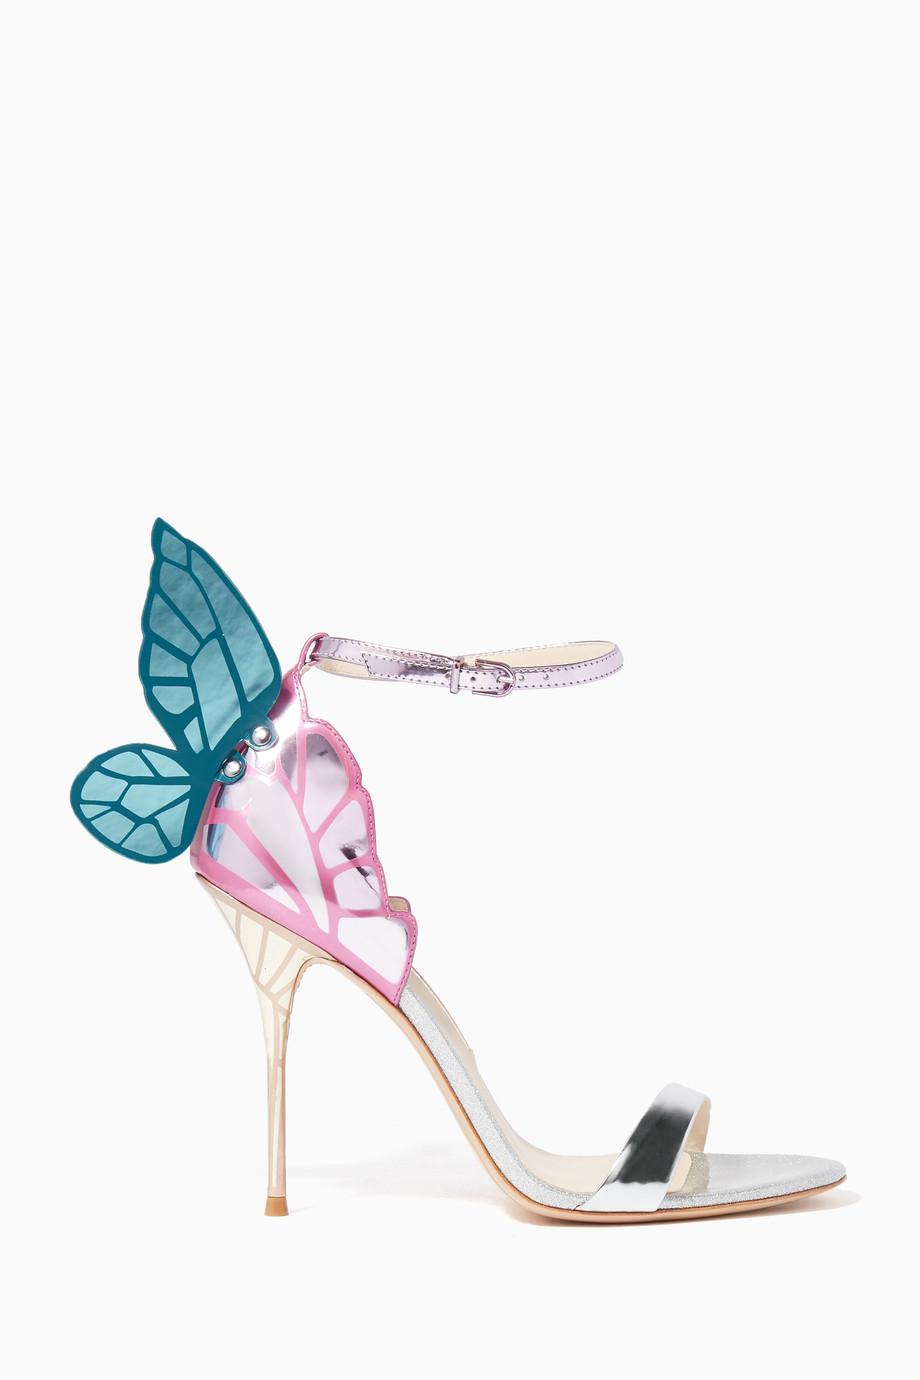 f17505442f2 Shop Sophia Webster Multicolour Multi-Coloured Chiara Butterfly ...